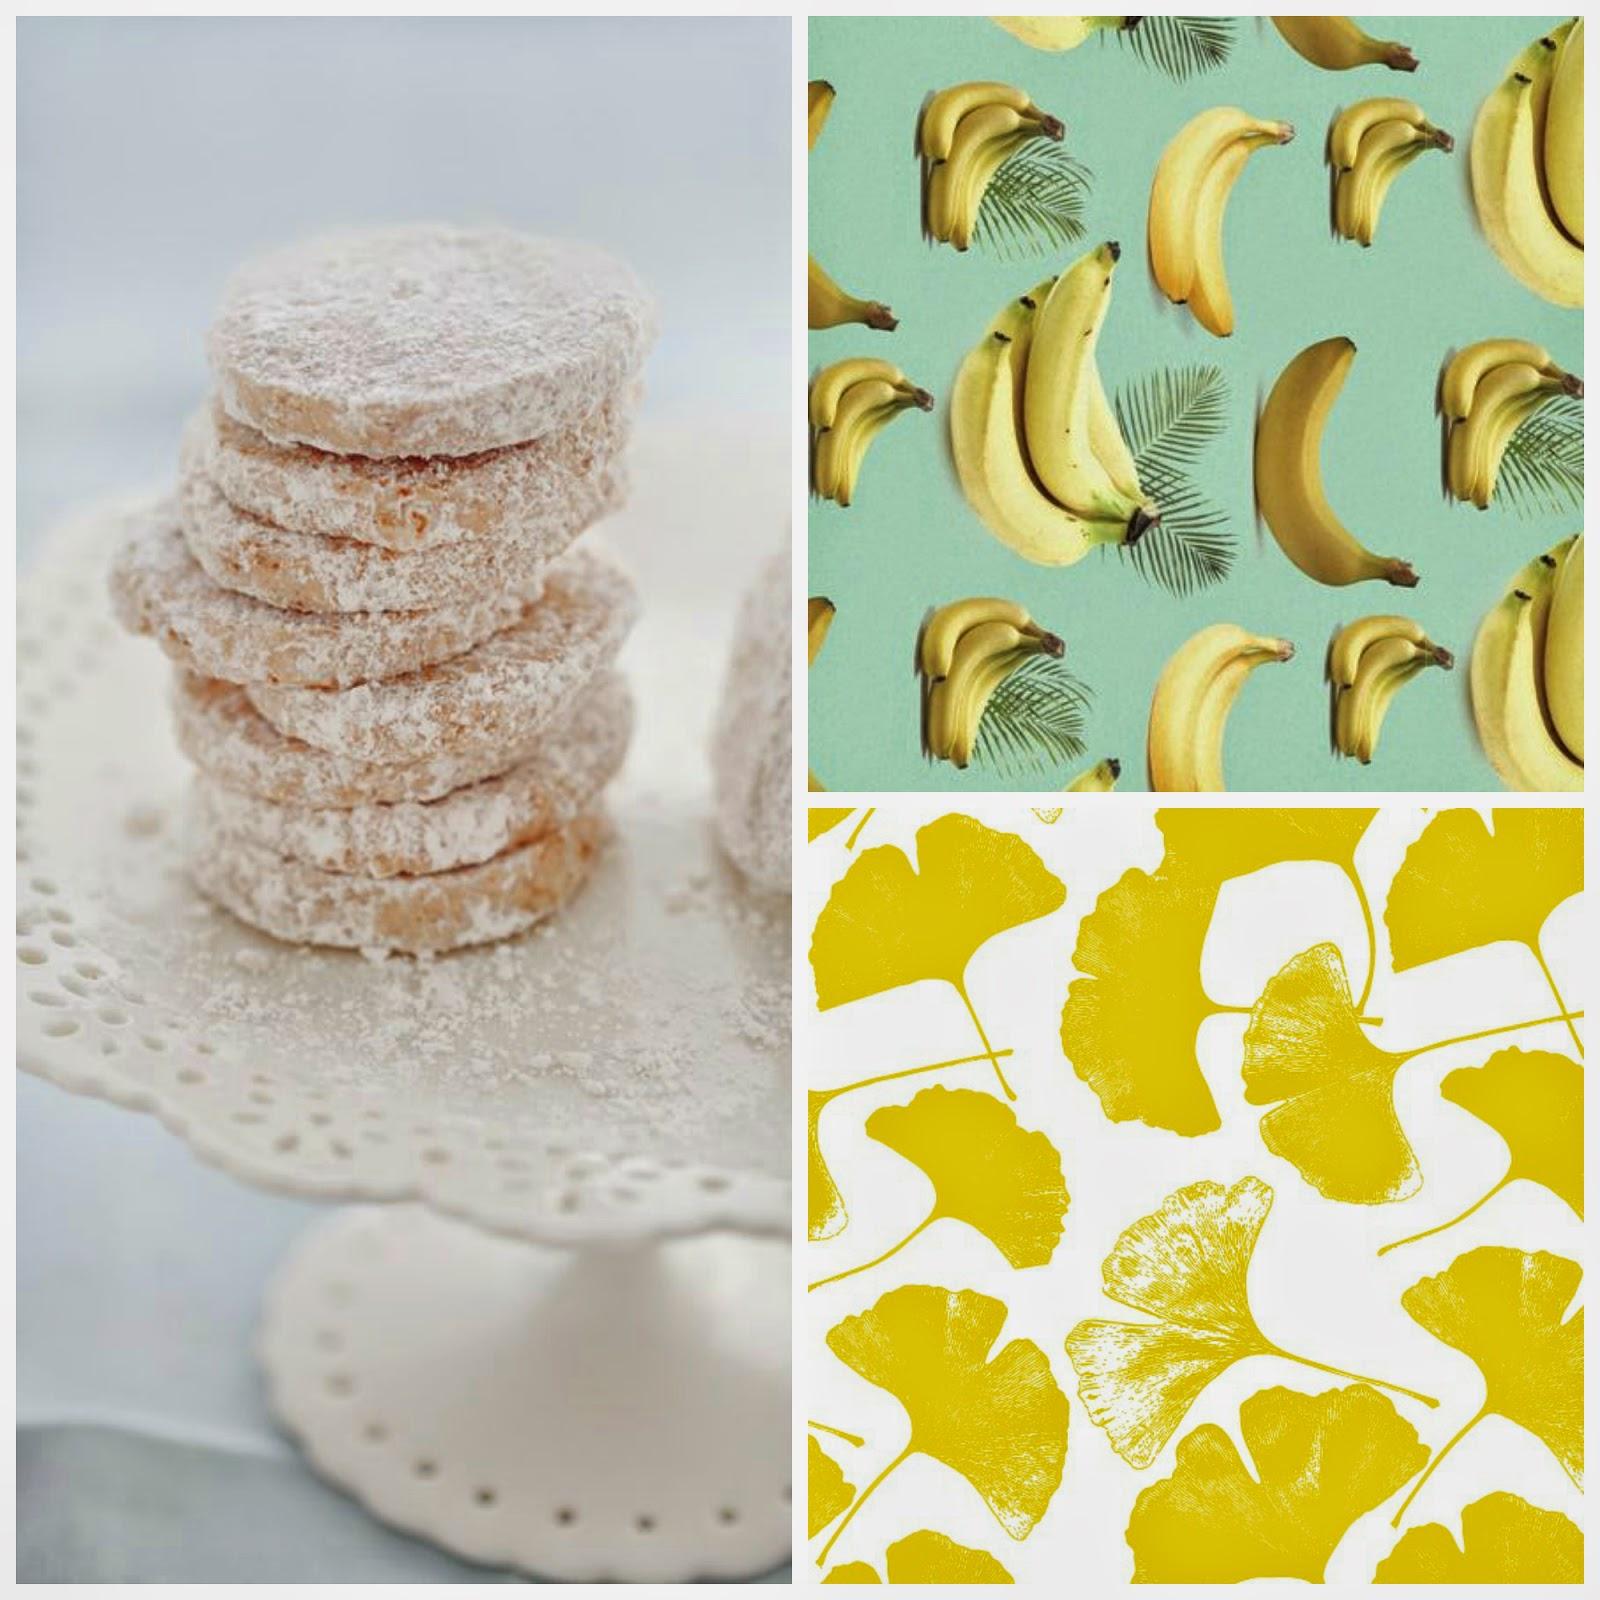 biscotti alla banana / banana cookies recipe